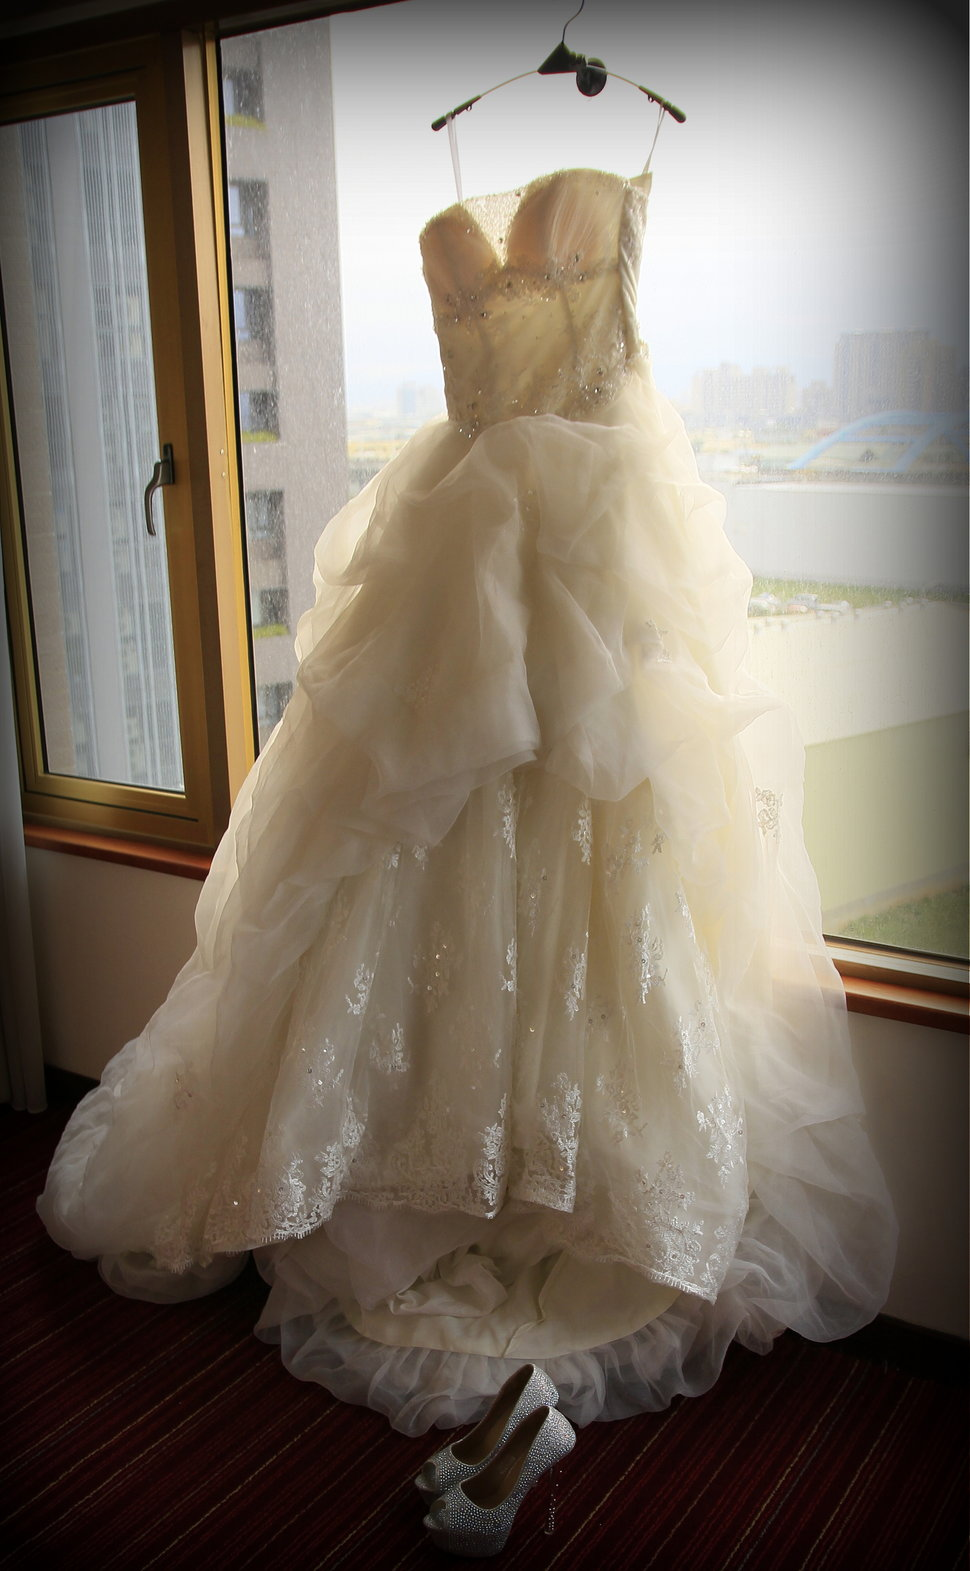 _MG_9348 - Yusin 攝影~與您同心祝福您永結同心 - 結婚吧